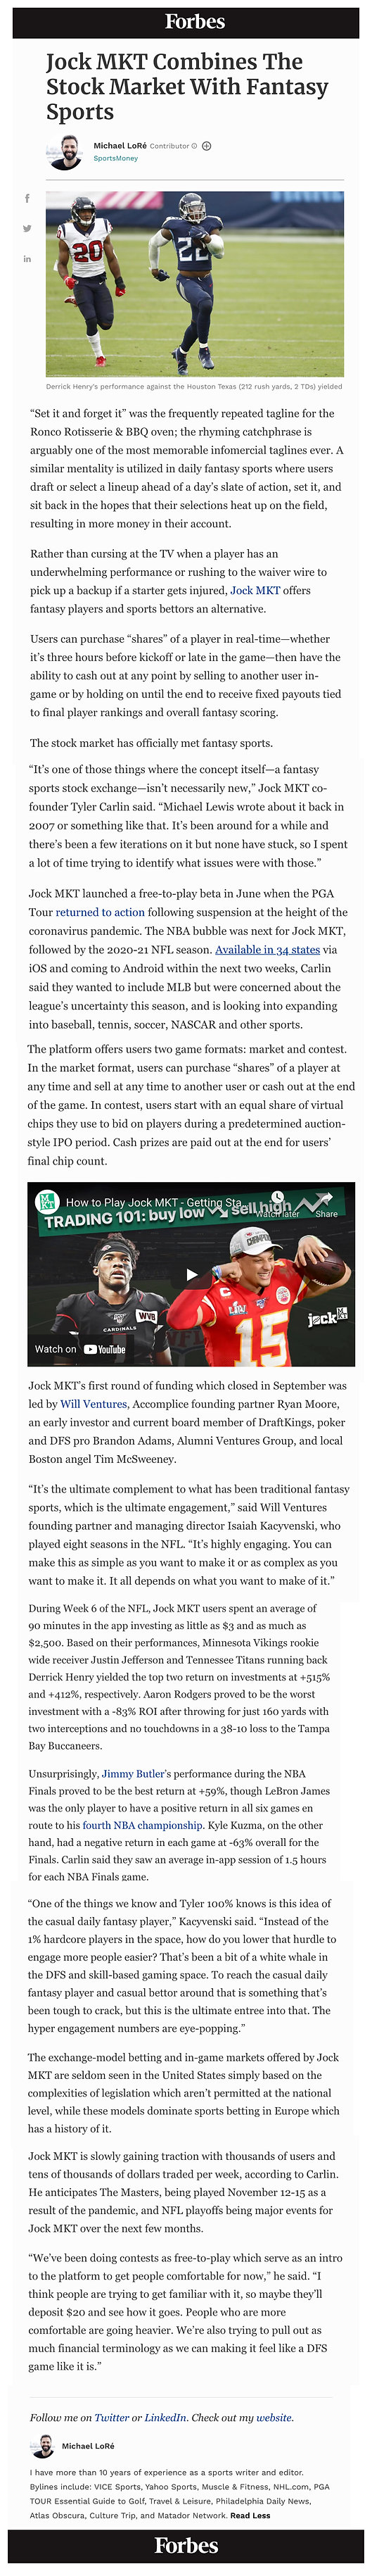 Forbes - Jock Market.jpg